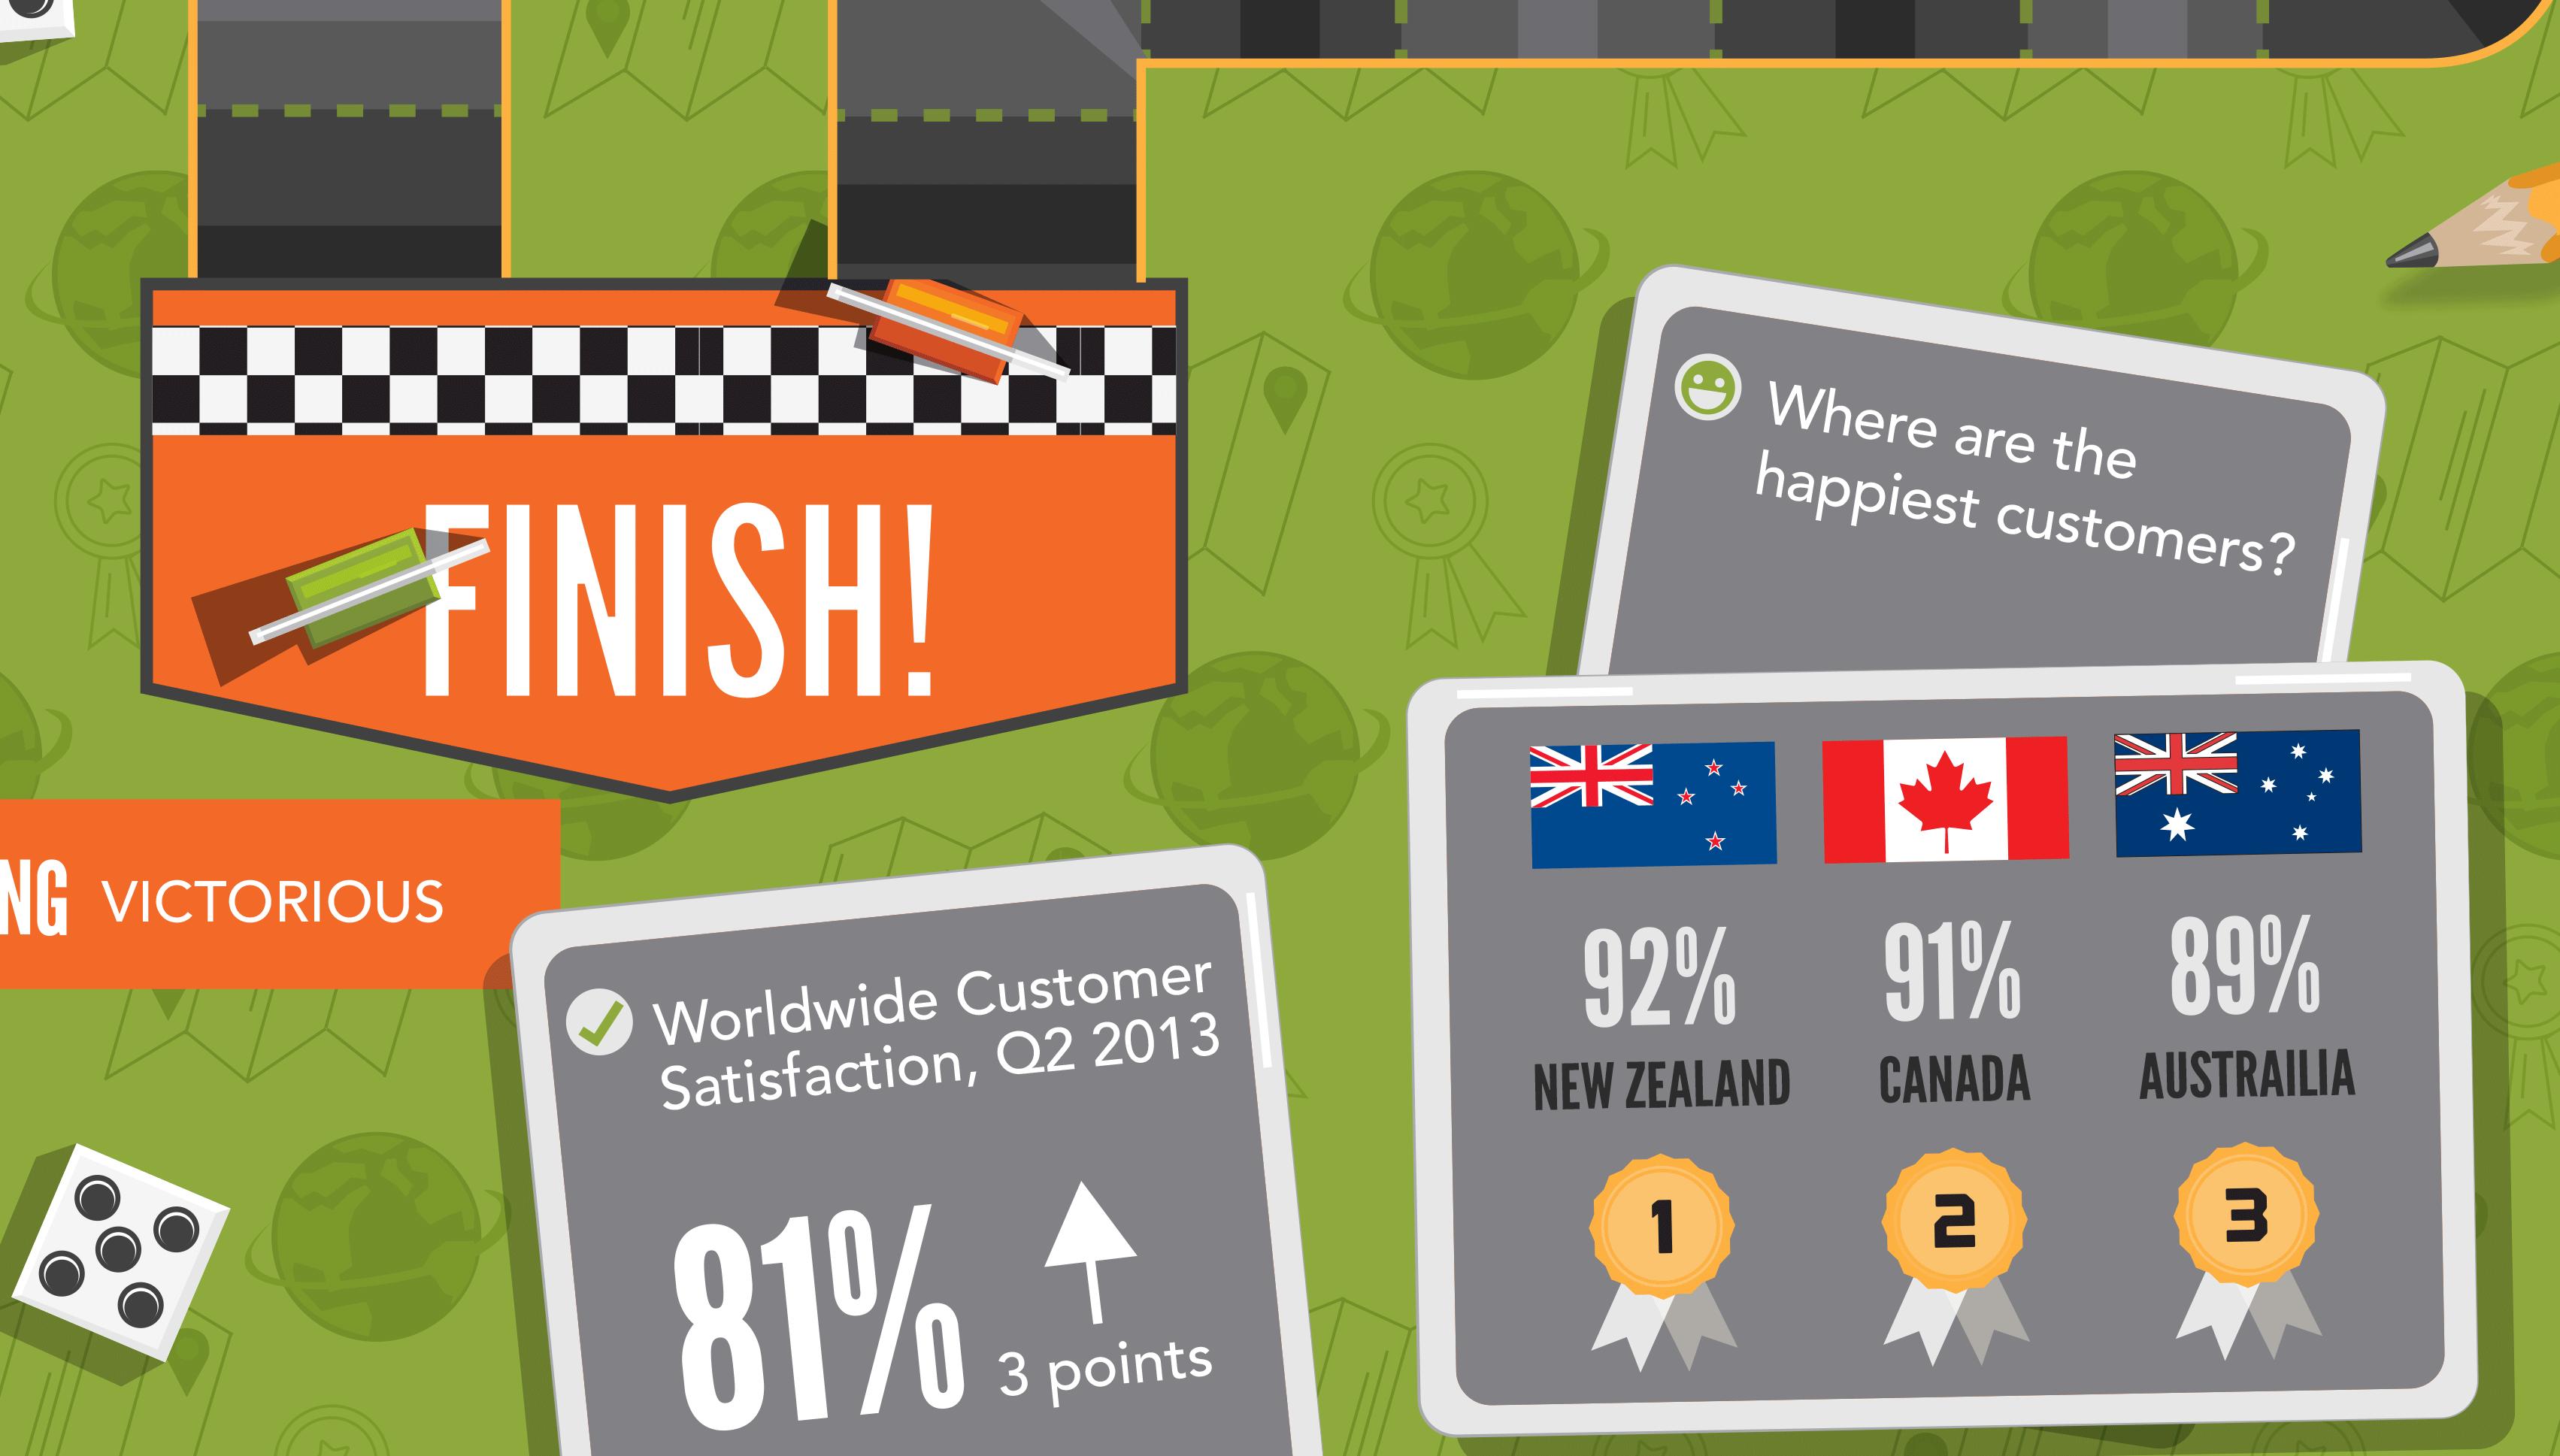 Winning customer service